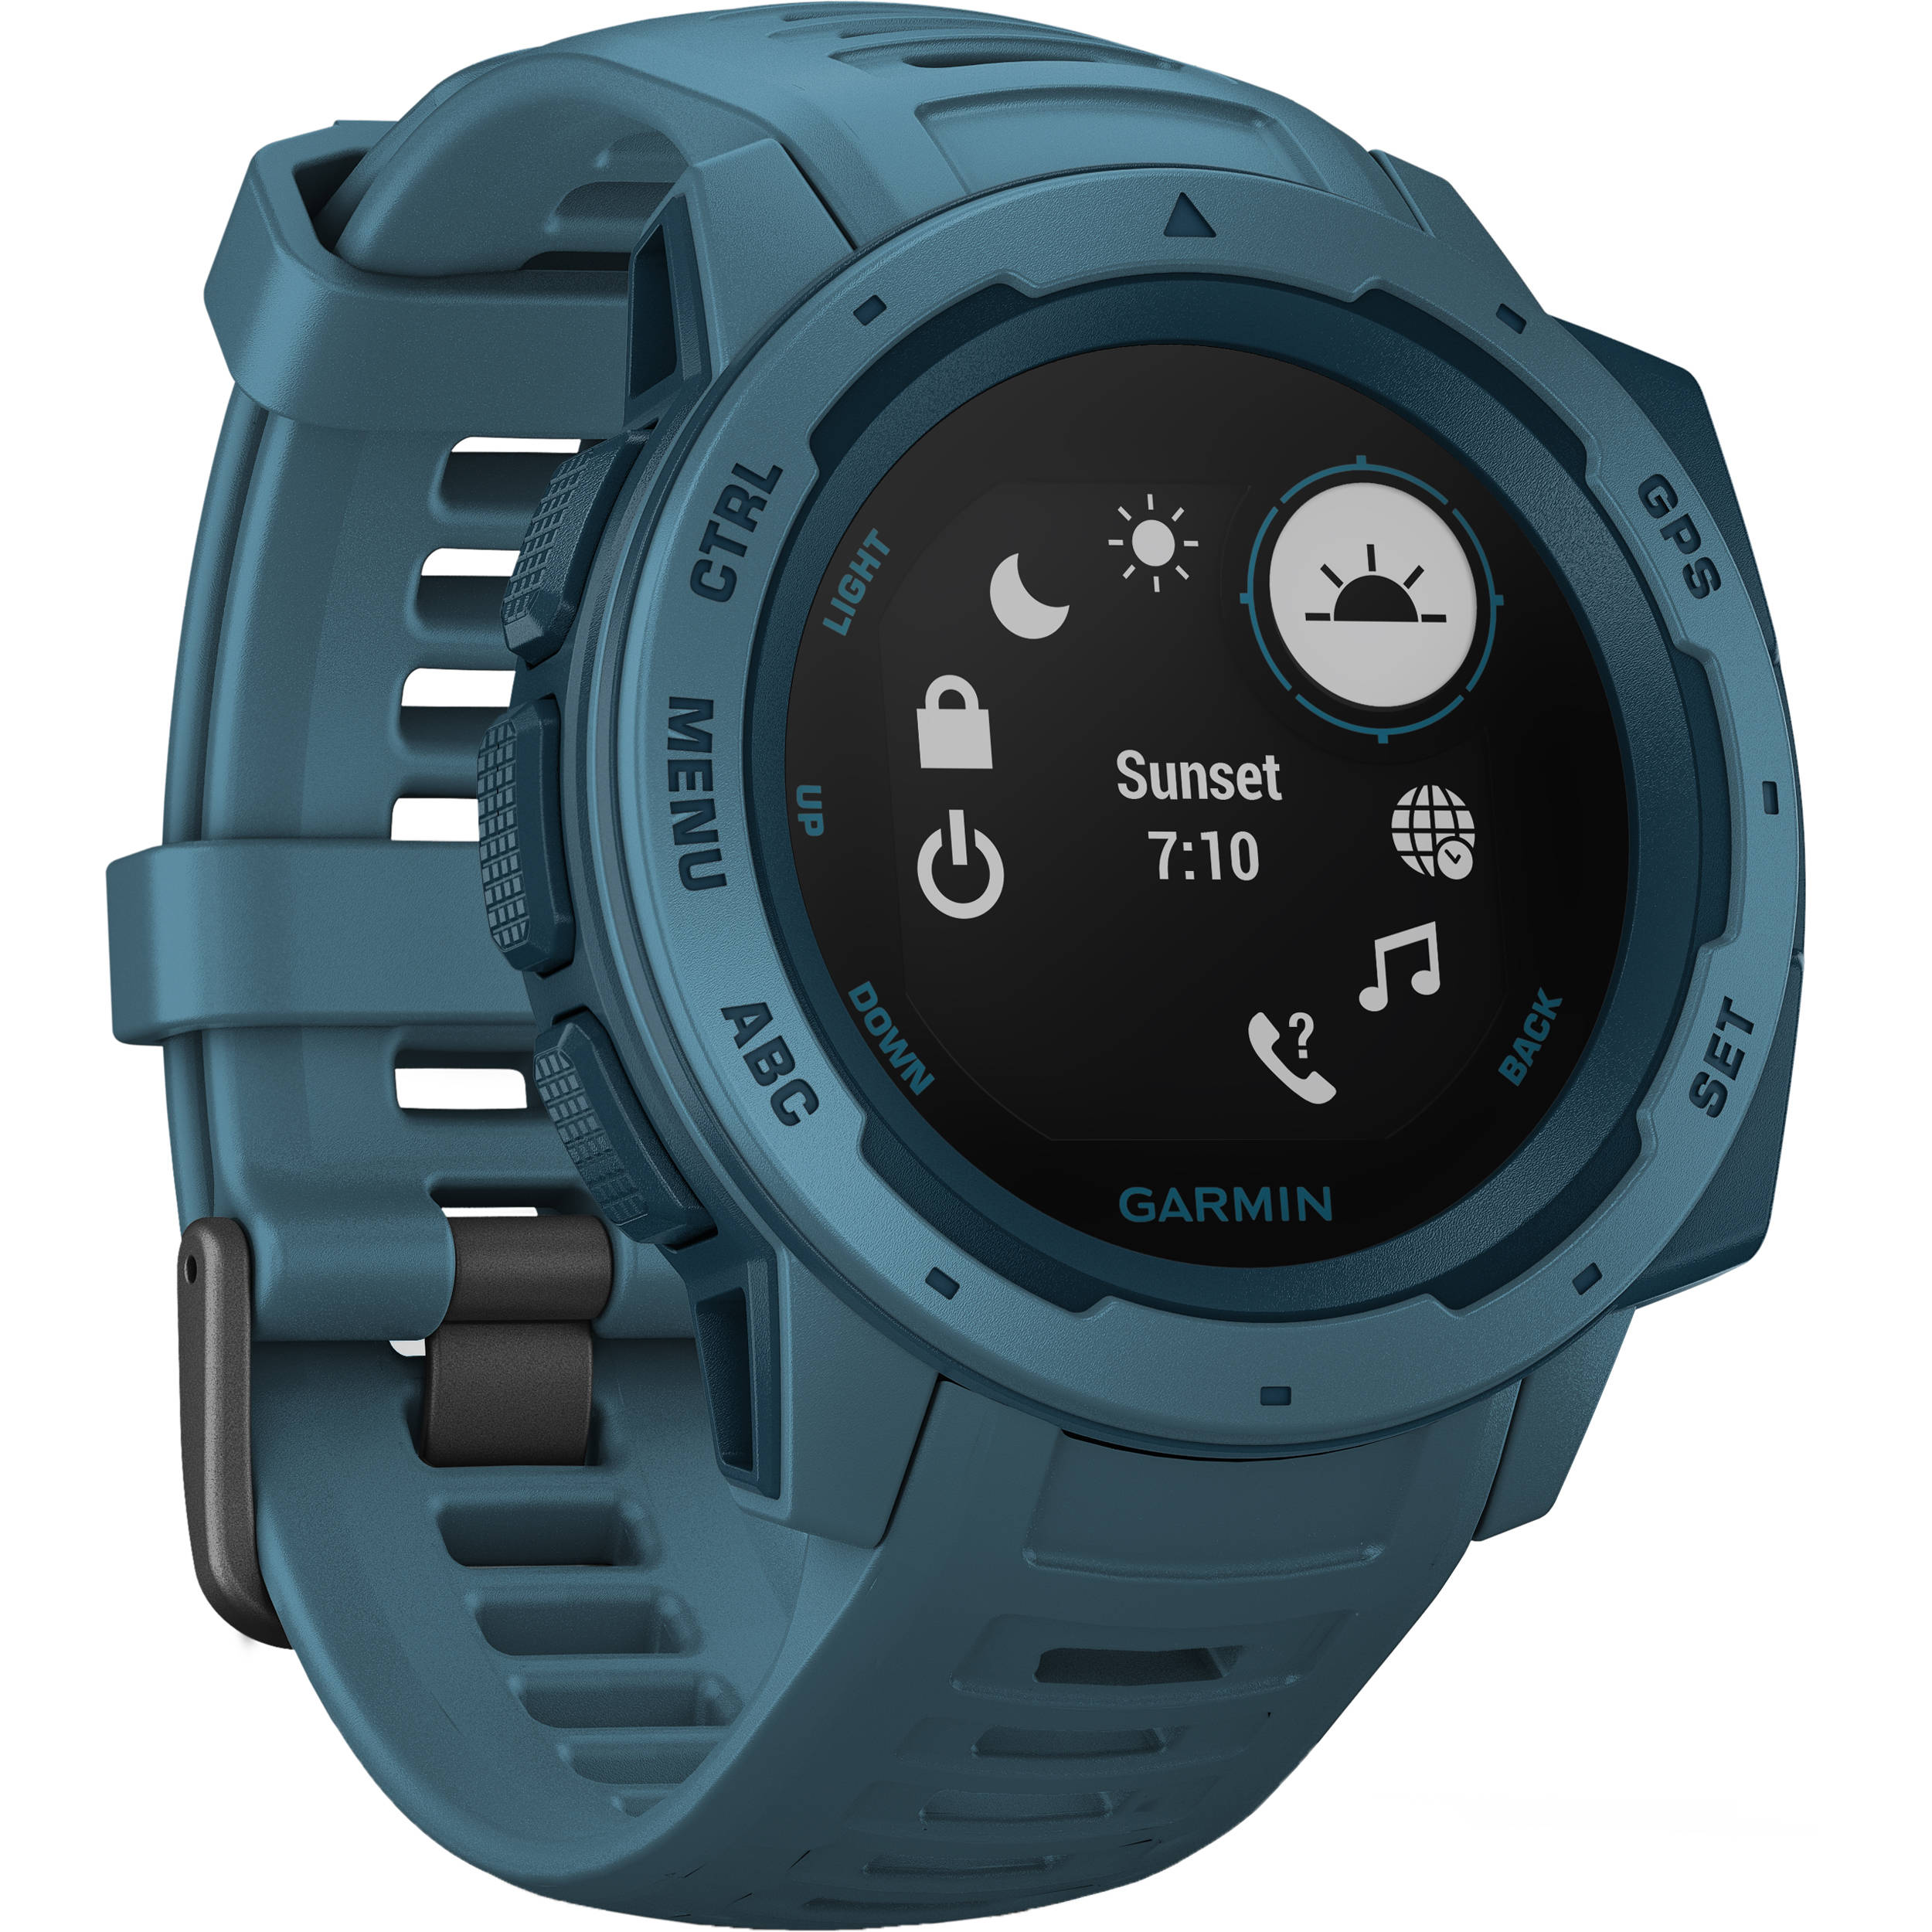 Garmin Gps Watch >> Garmin Instinct Outdoor Gps Watch Lakeside Blue